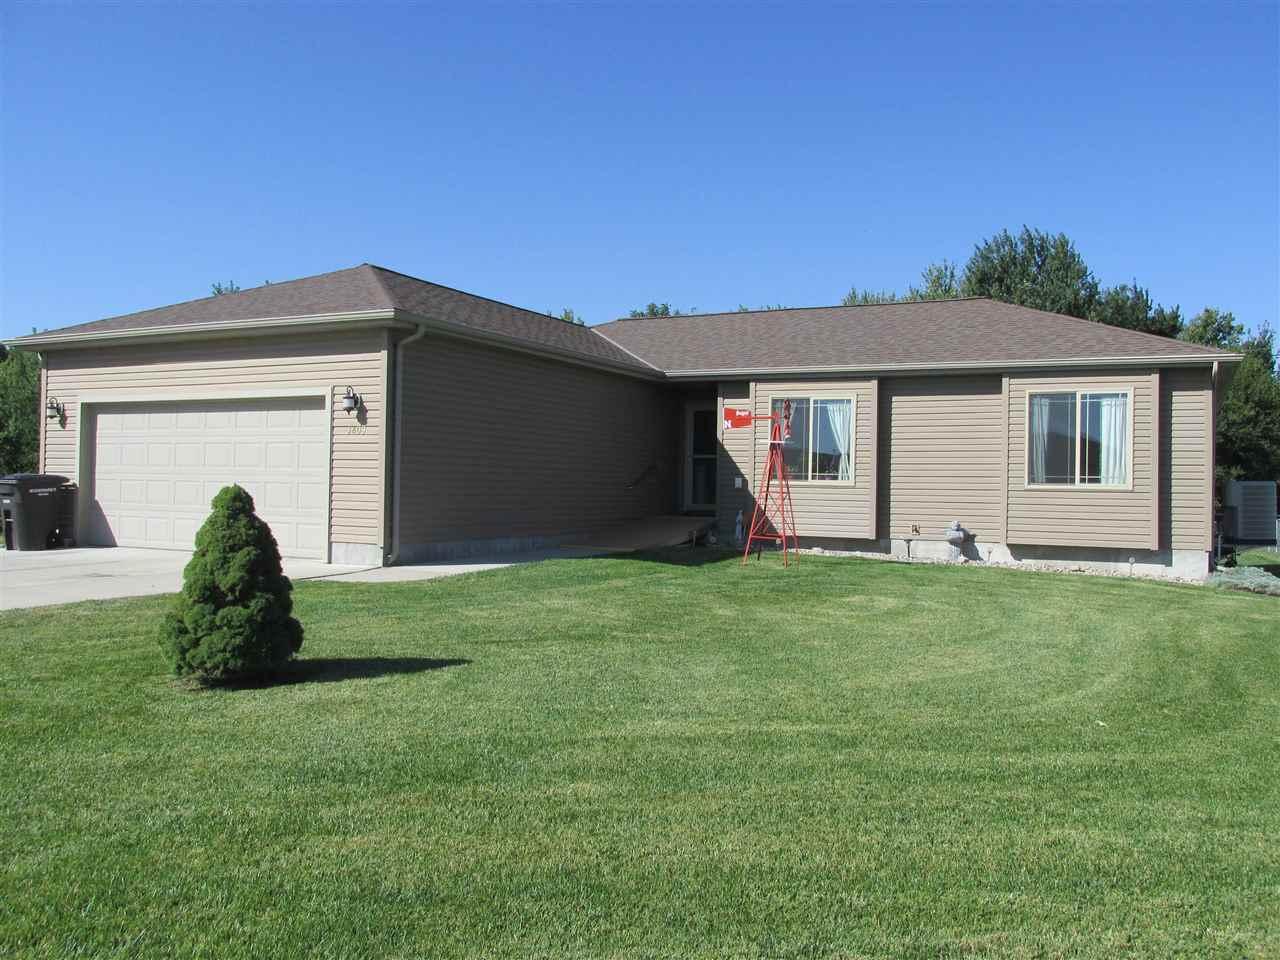 Real Estate for Sale, ListingId: 35428670, Hastings,NE68901